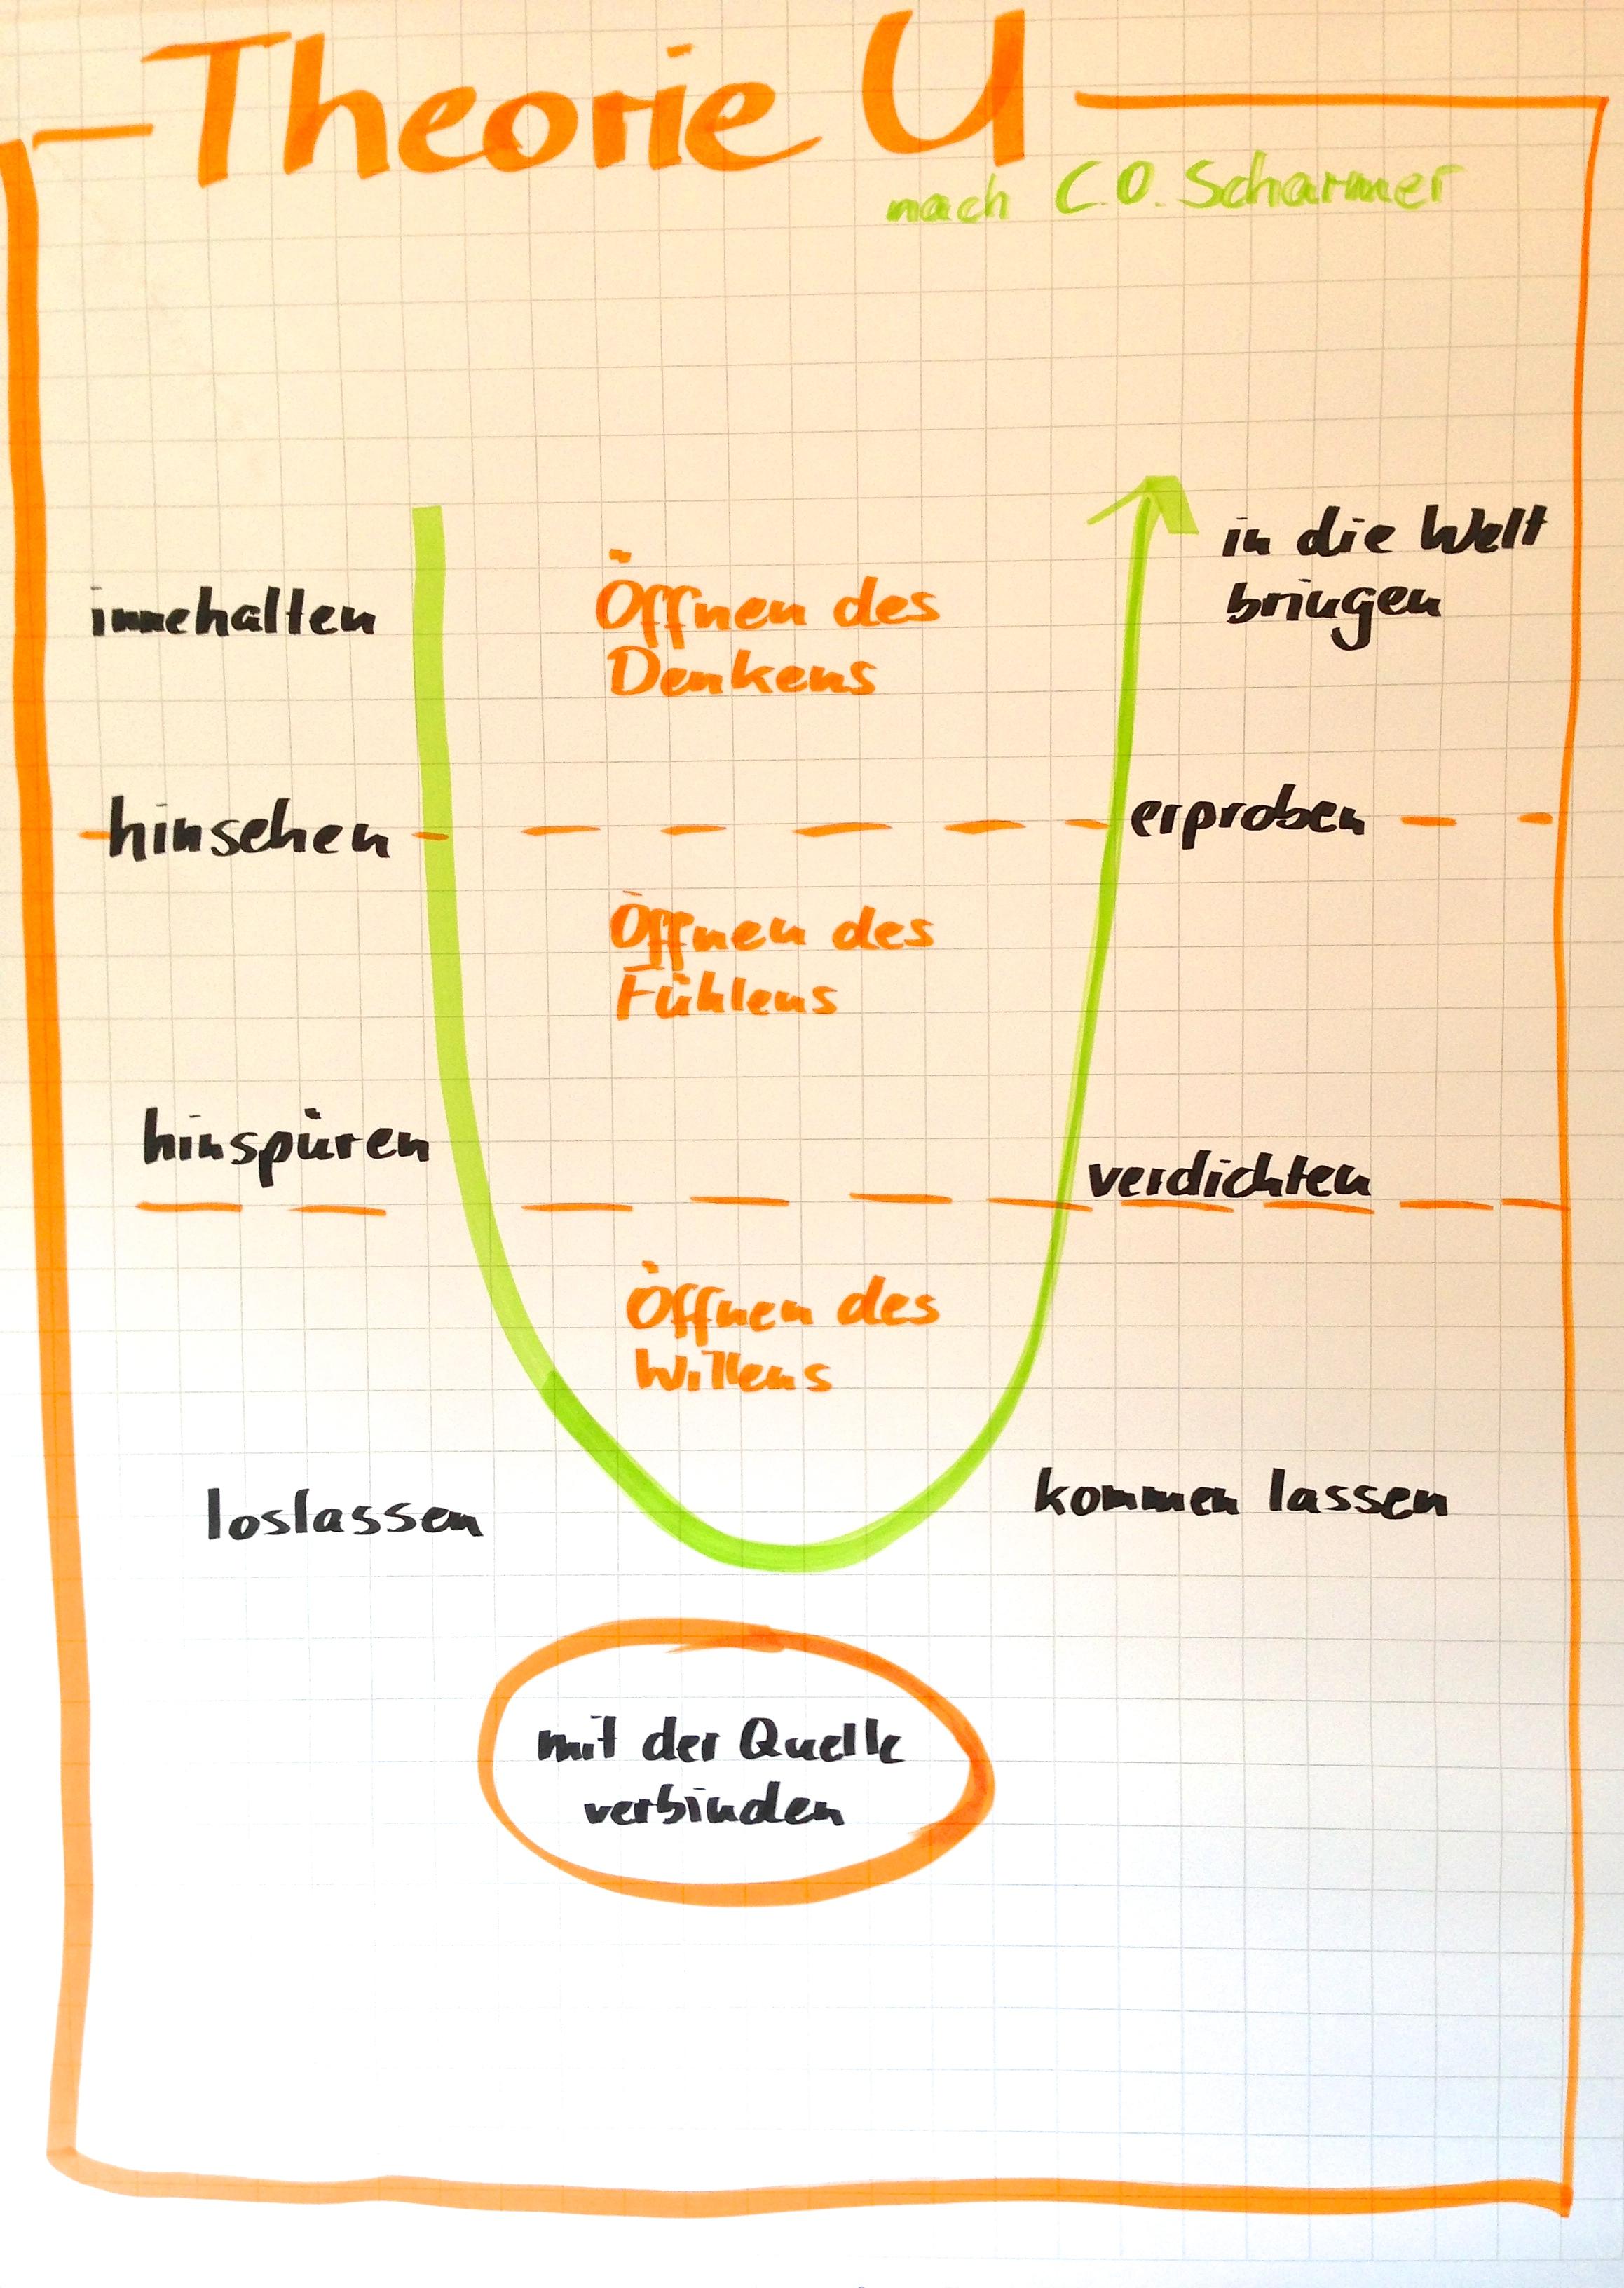 Theorie U nach Prof. C.O. Scharmer